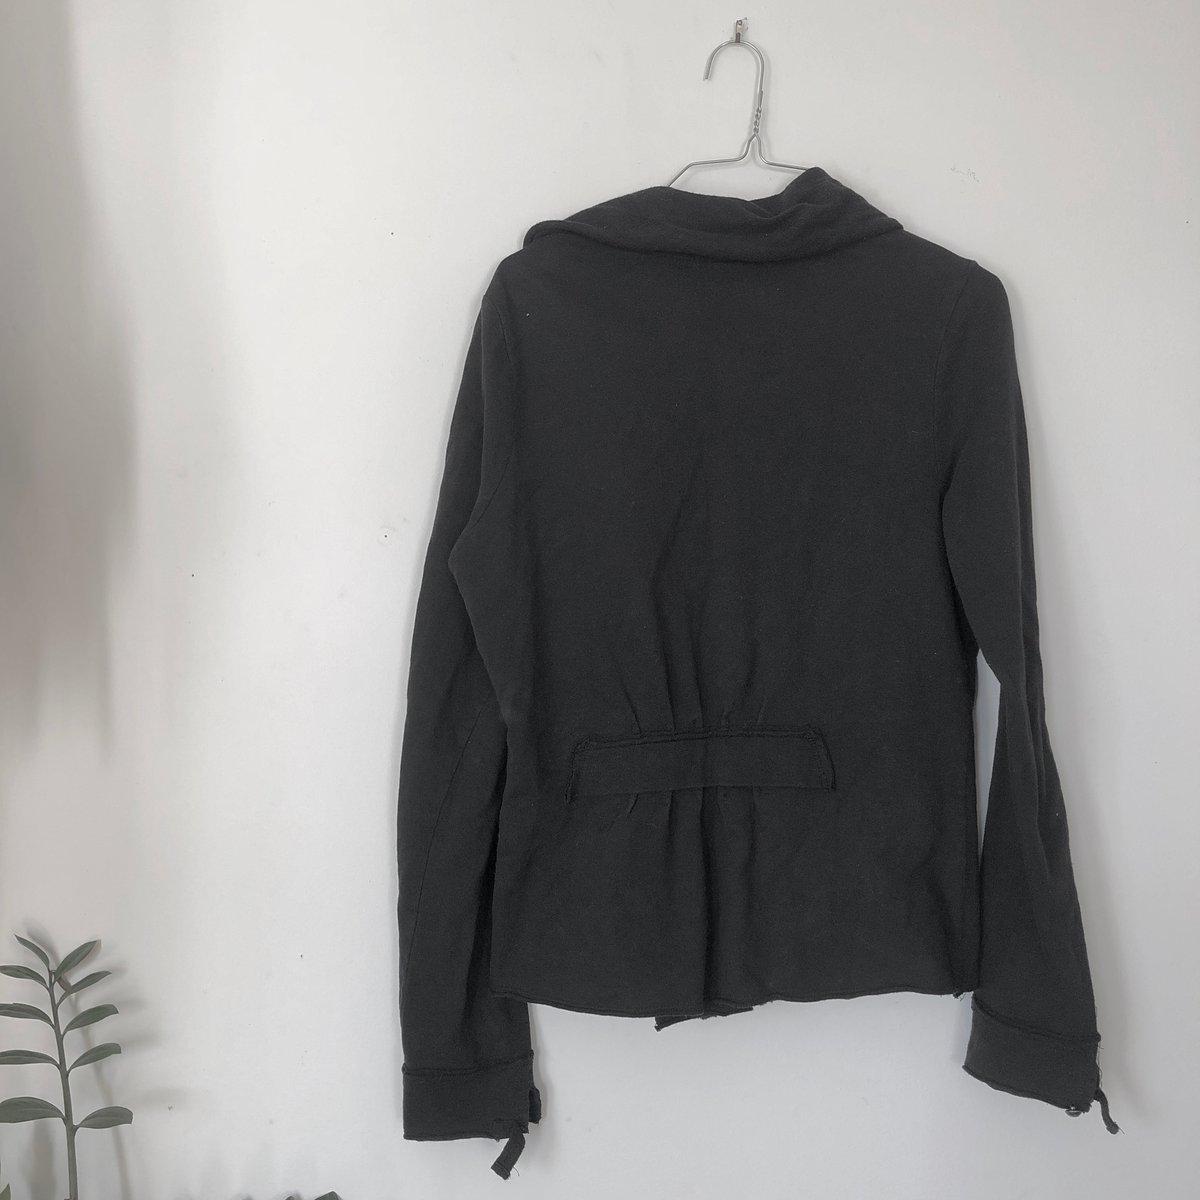 Image of Black Draped Sweatshirt